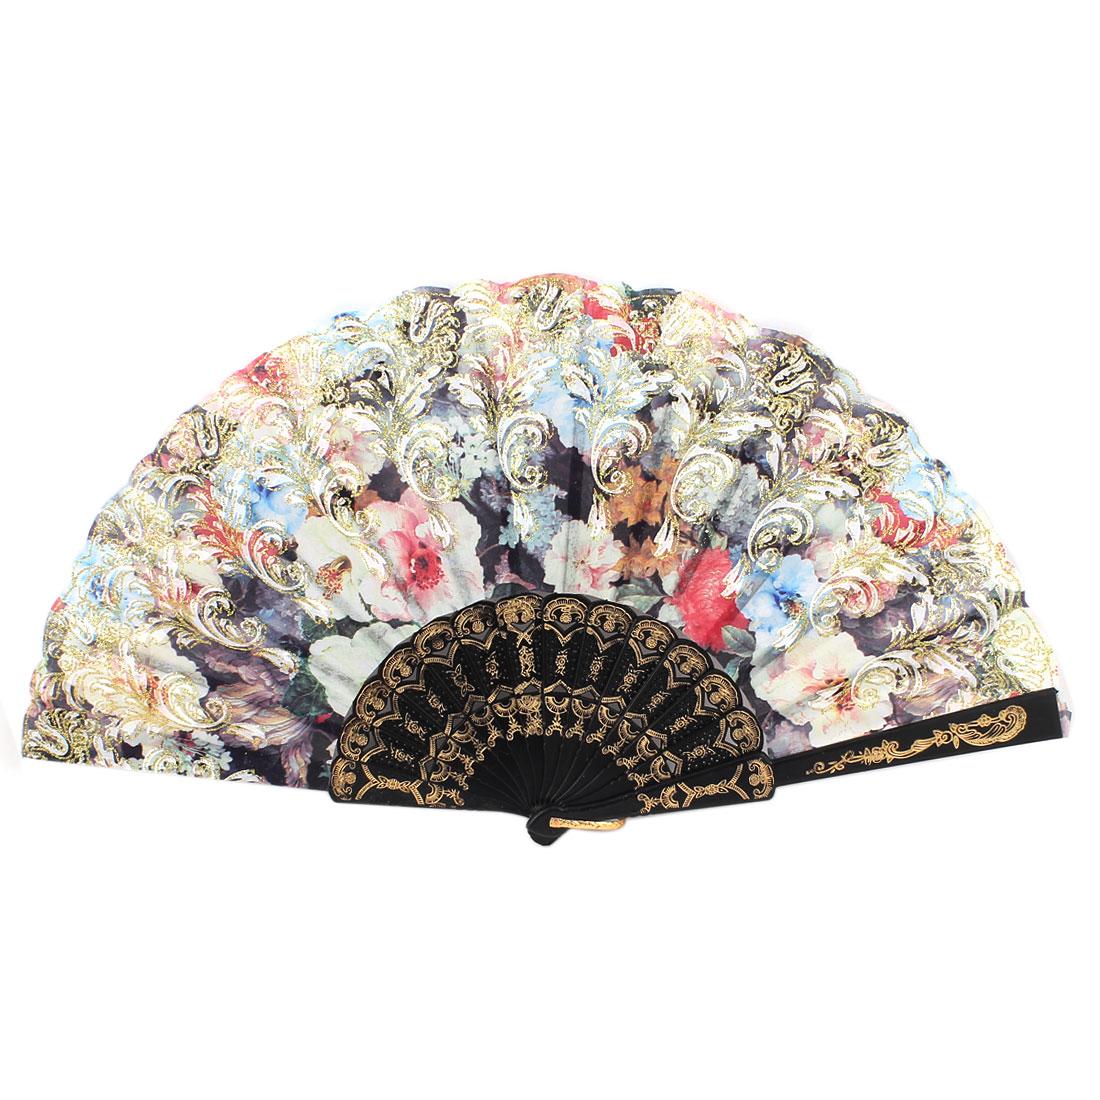 Plastic Flower Floral Print Folding Hand Fan Dancing Wedding Party Favor